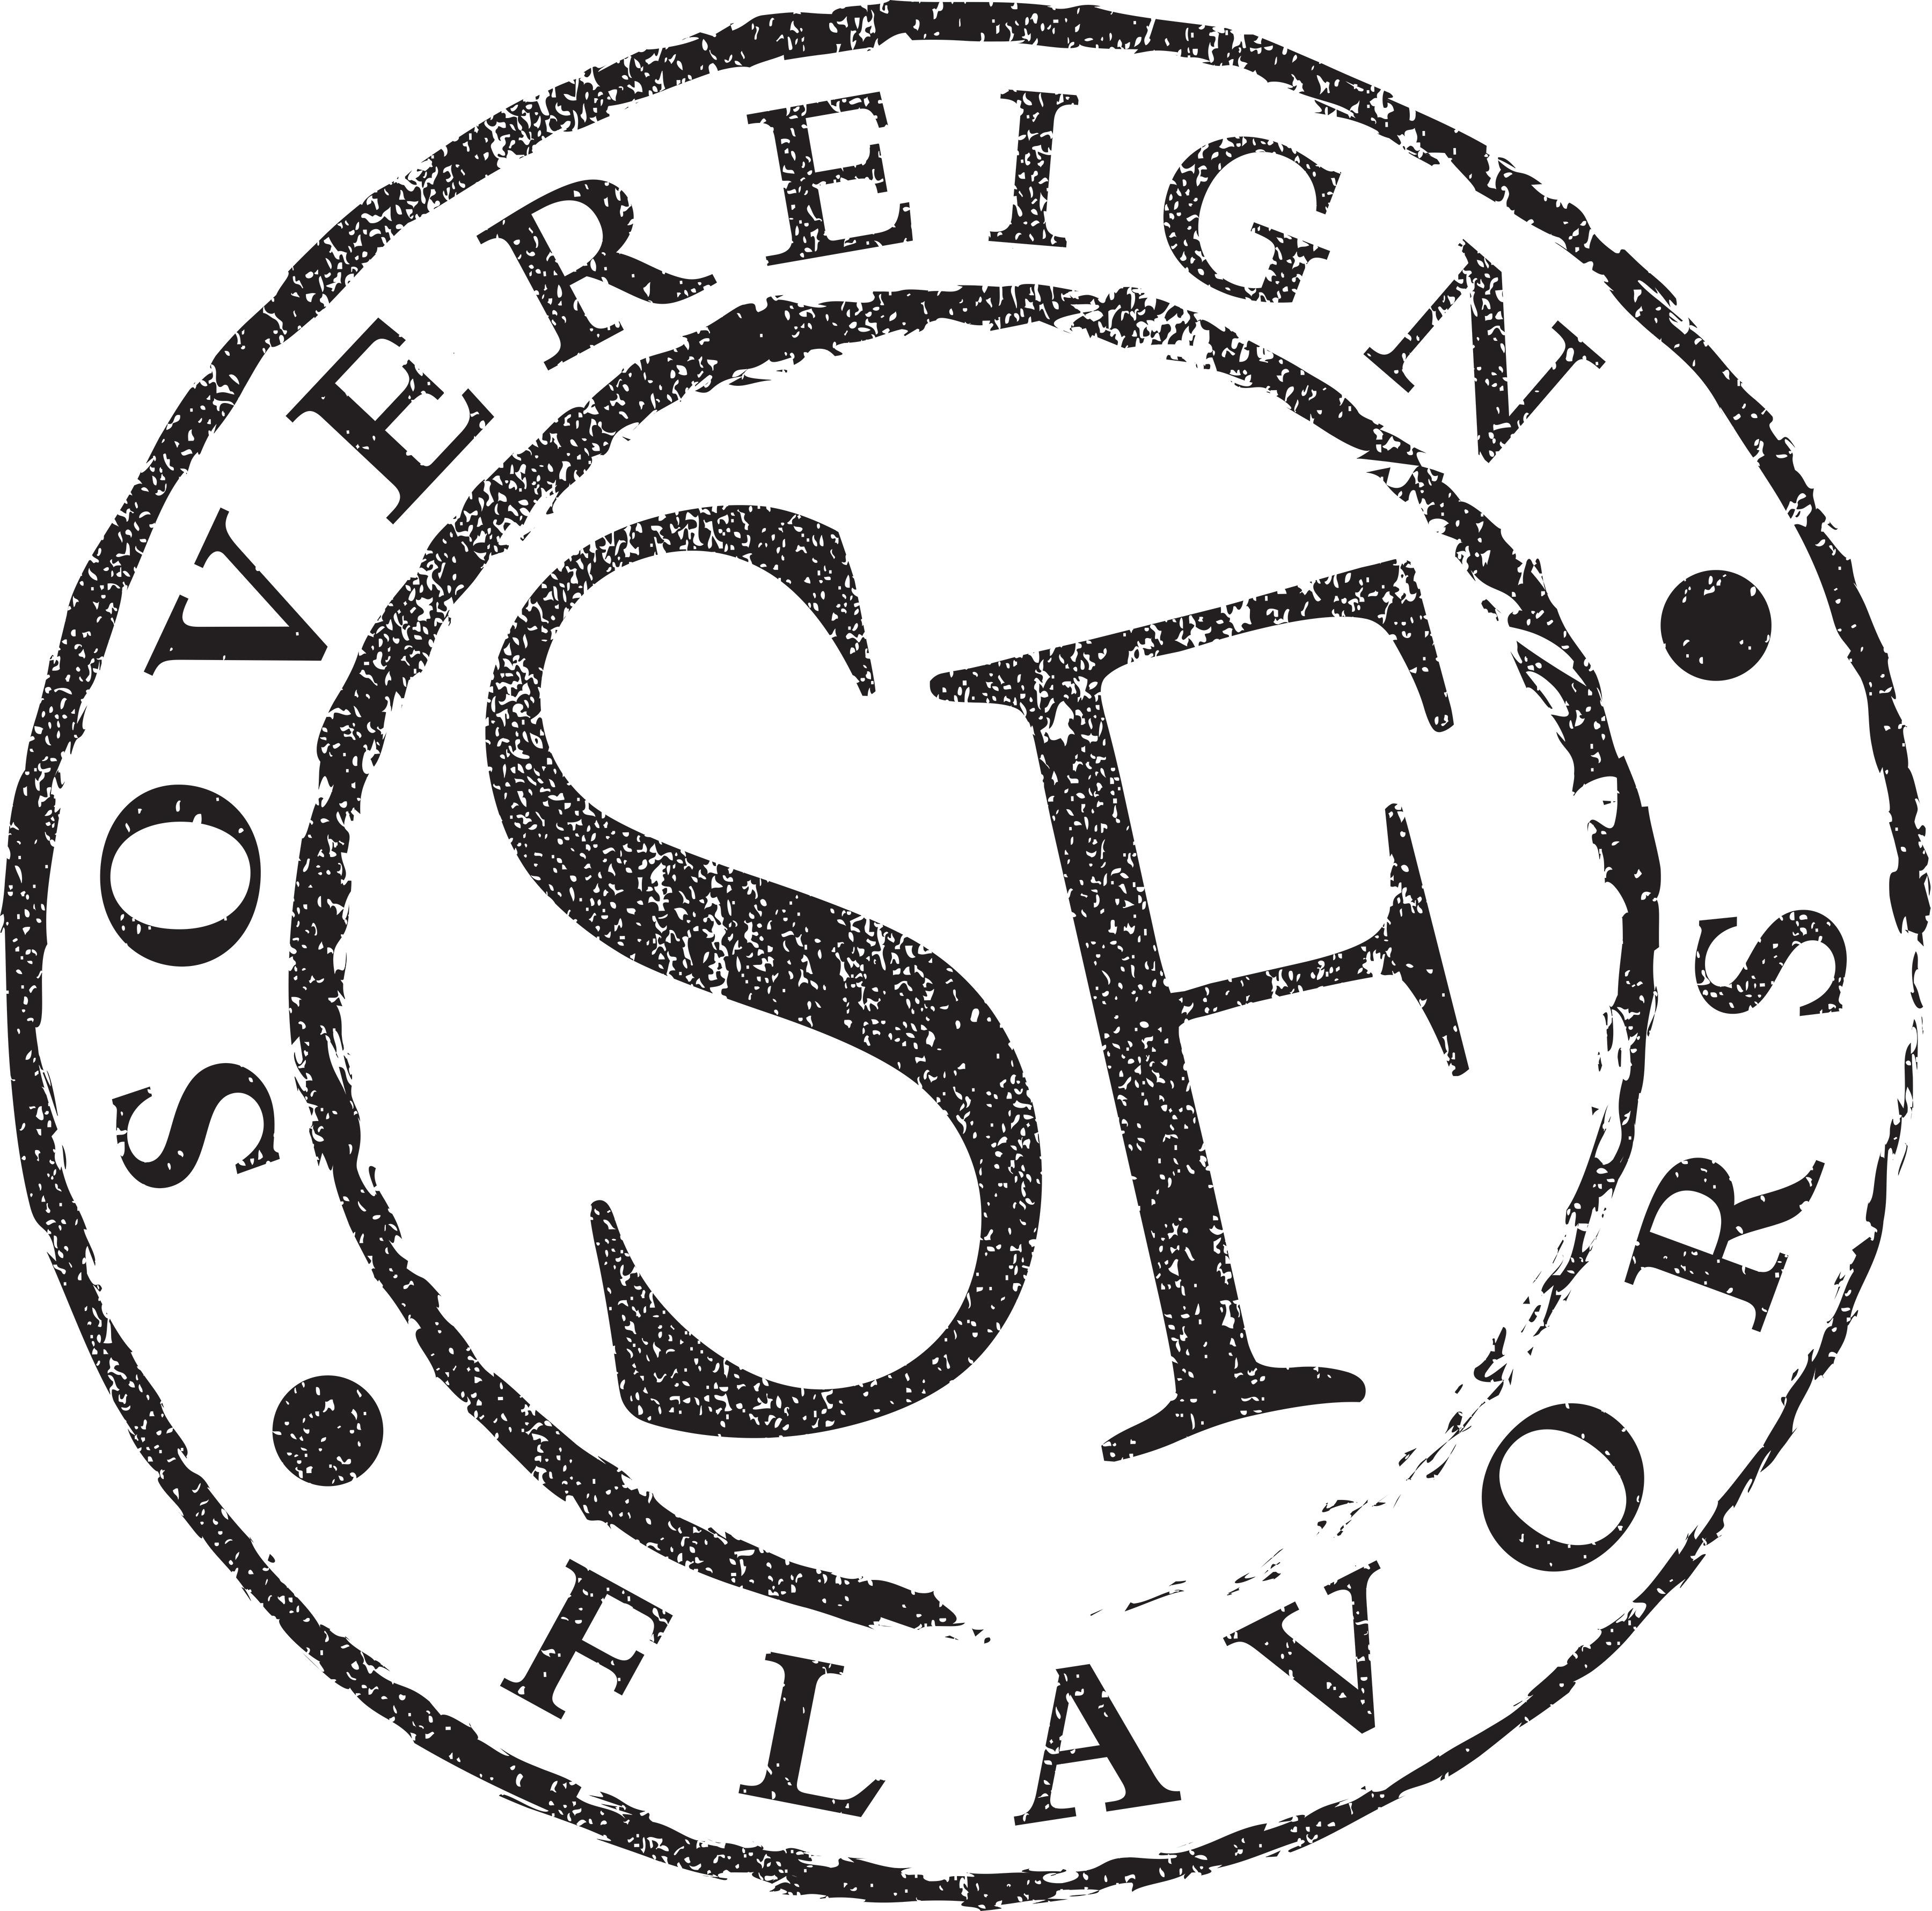 Sovereign Flavors - sponsoring Brewbound Session San Diego 2016